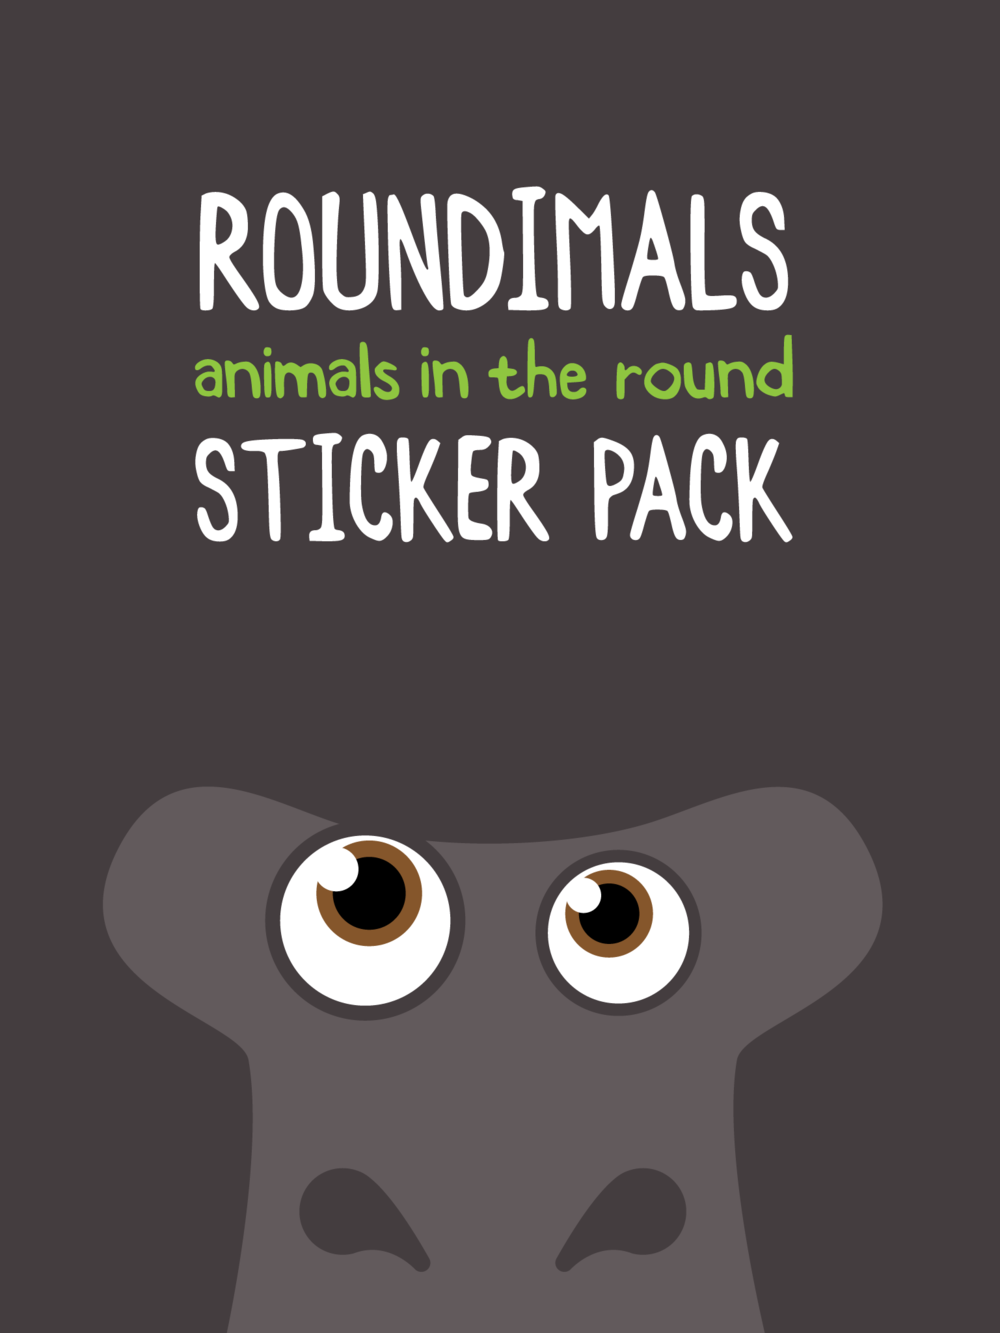 Roundimals_SS_iPad_1.png